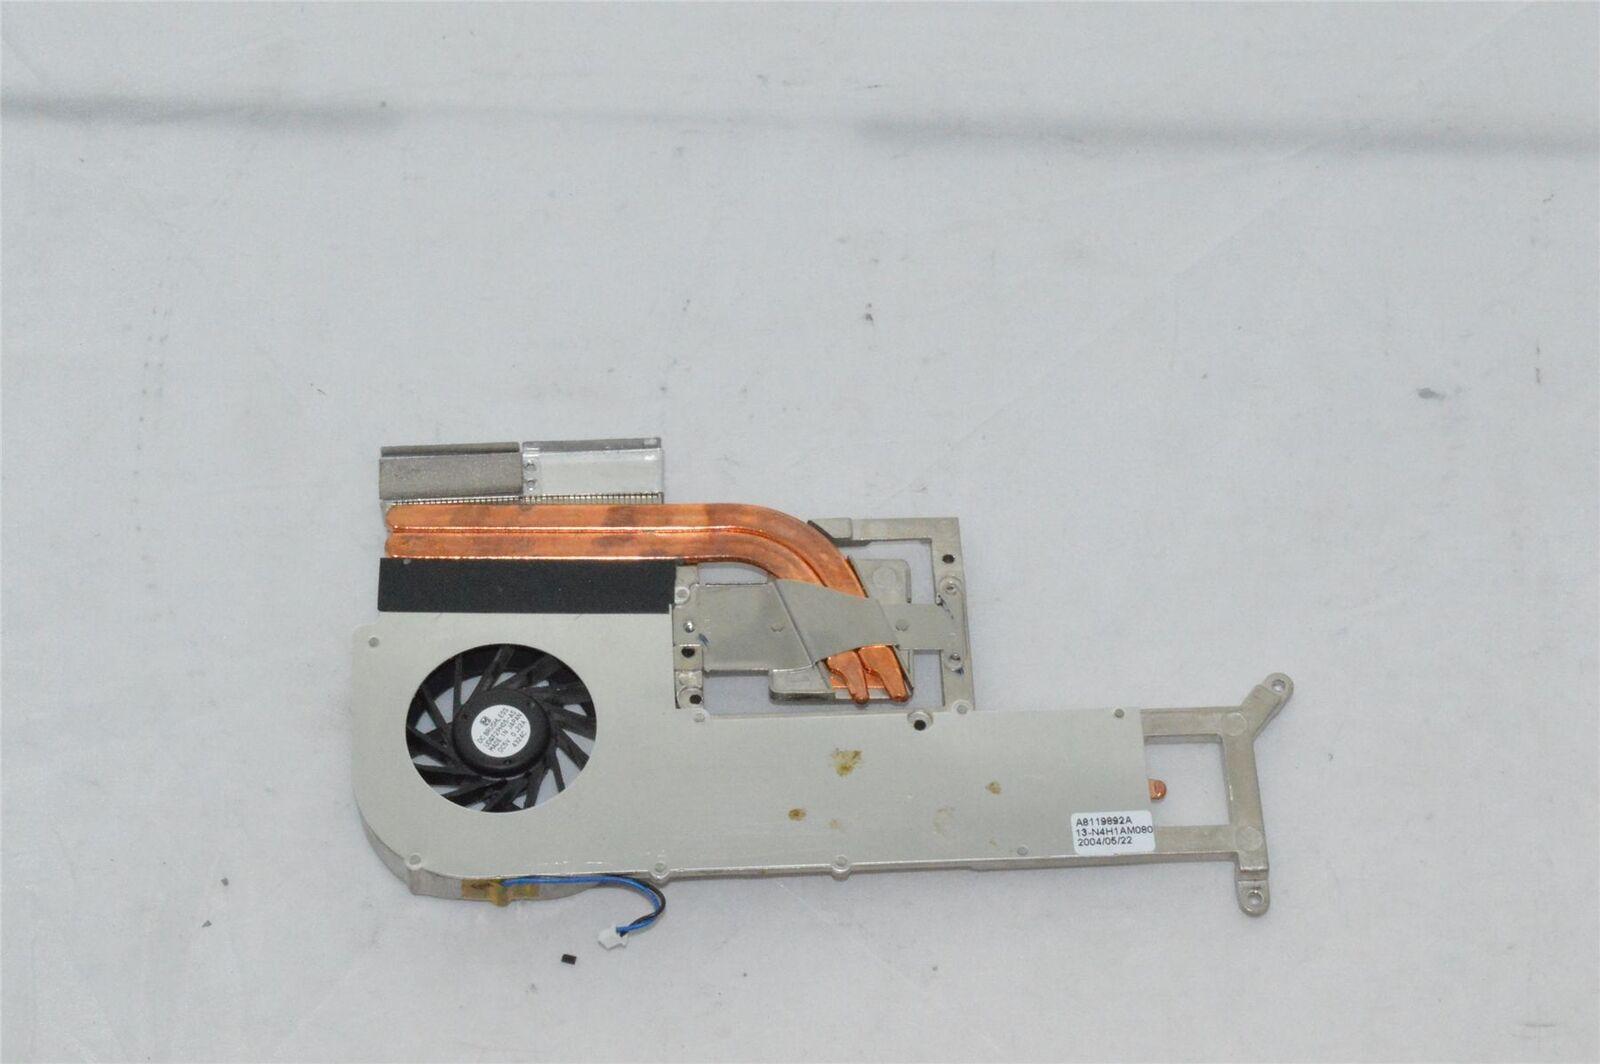 Sony Vaio PCG-8Q4M CPU/GPU Heatsink/Fan 13-n4h1am080, Used